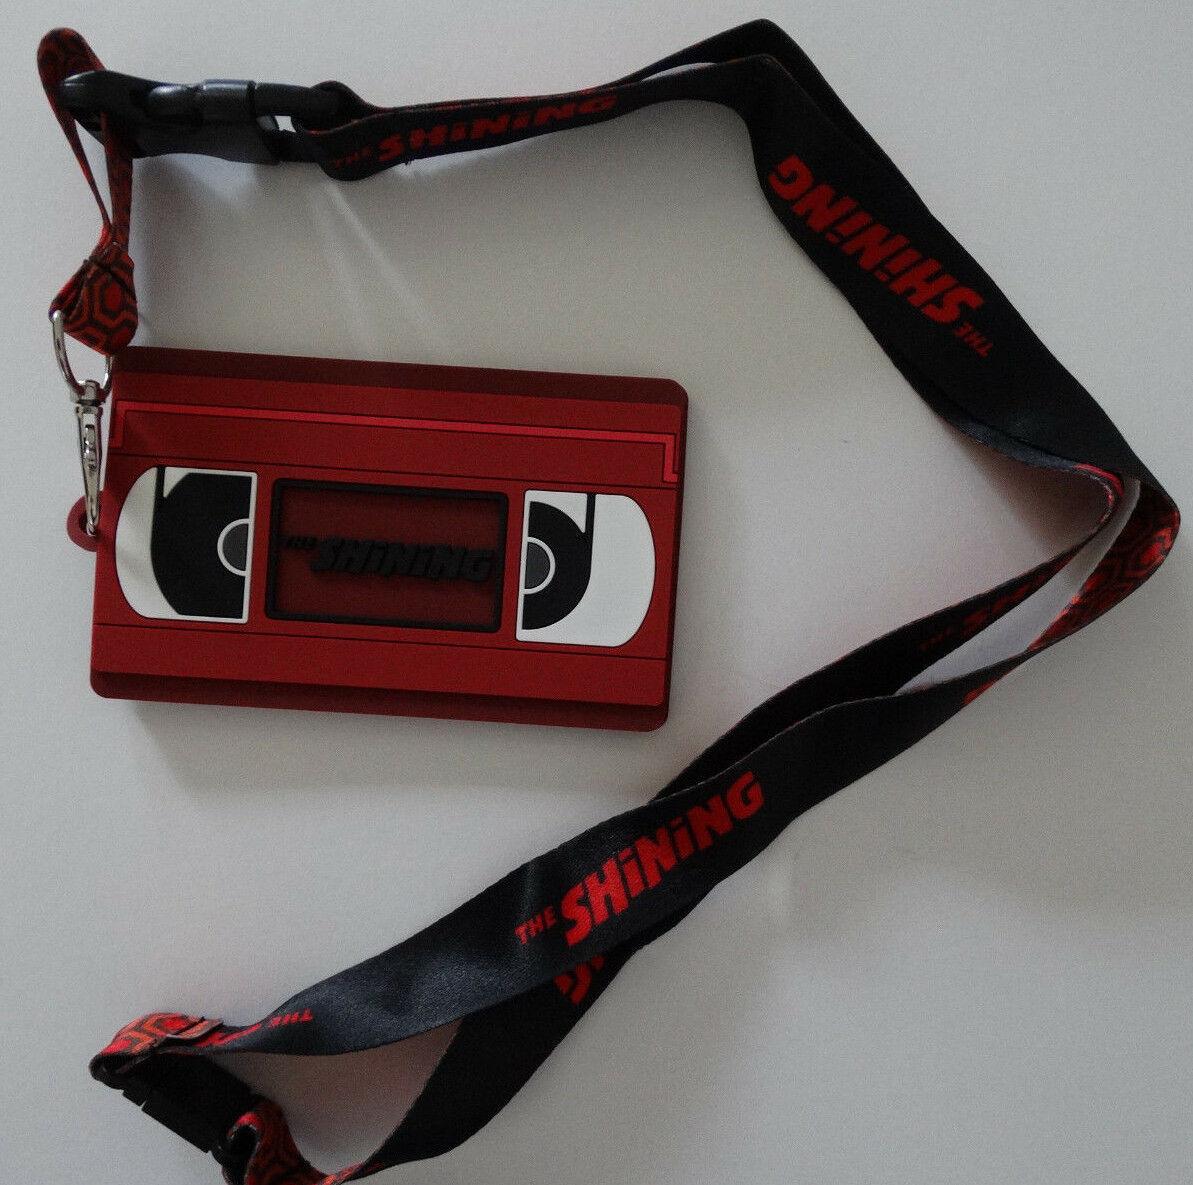 The Shining Movie VHS Tape Horror Movie ID Badge Holder Keychain Lanyard